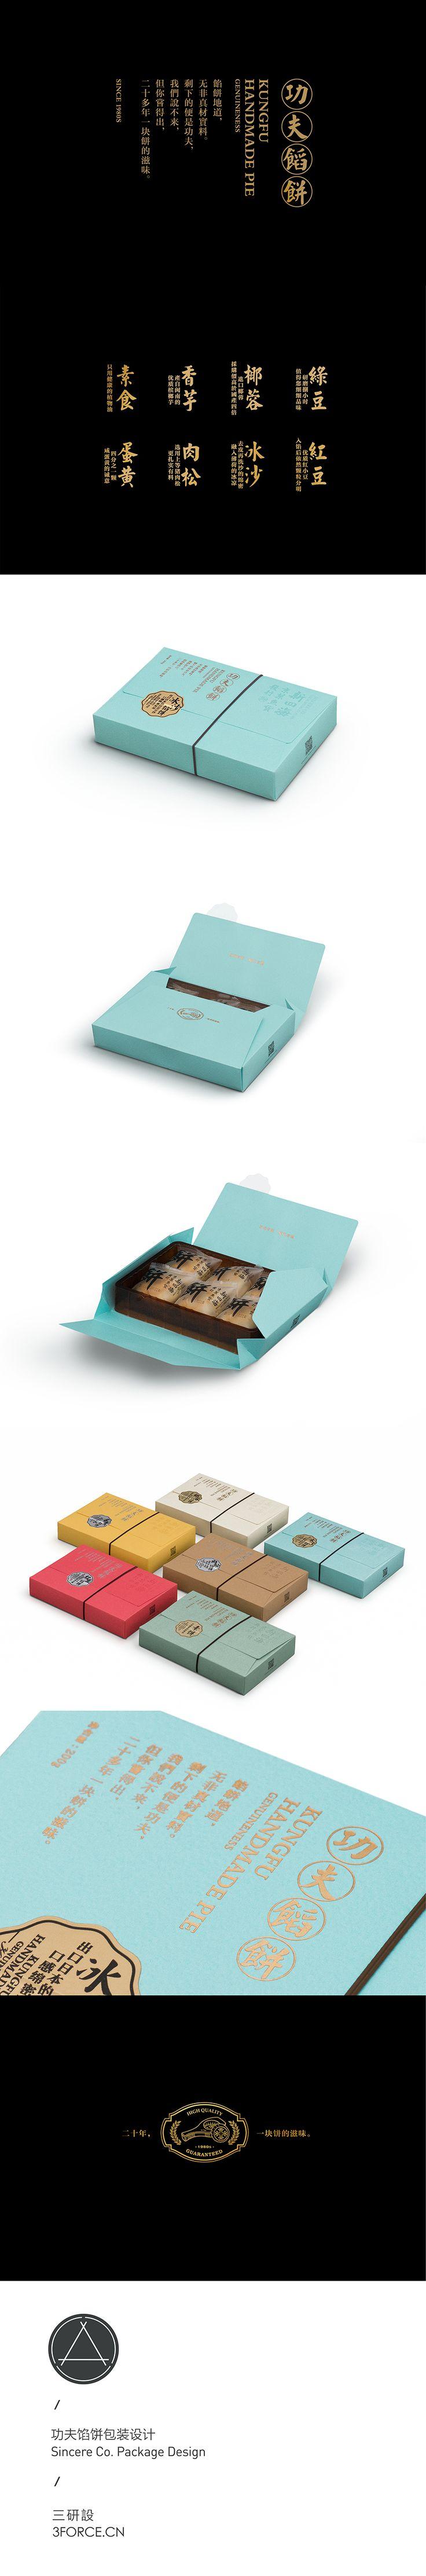 KUNGFU Handmade Pie Packaging Design / 功夫餡餅產 // Inspiration for the EMRLD14 Team // www.emrld14.com